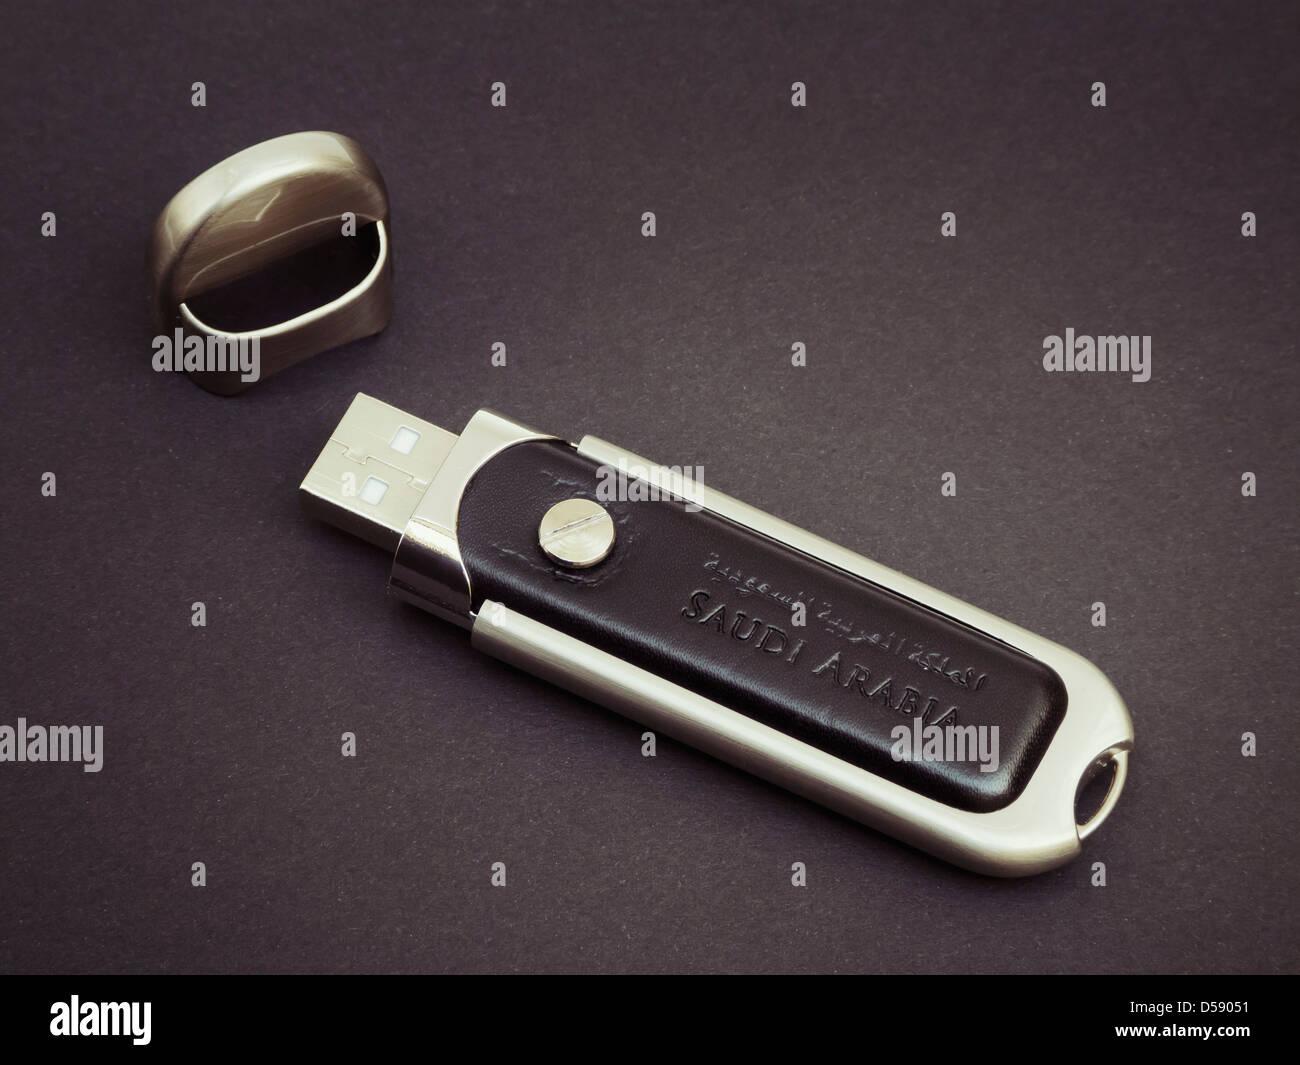 USB Drive - Stock Image